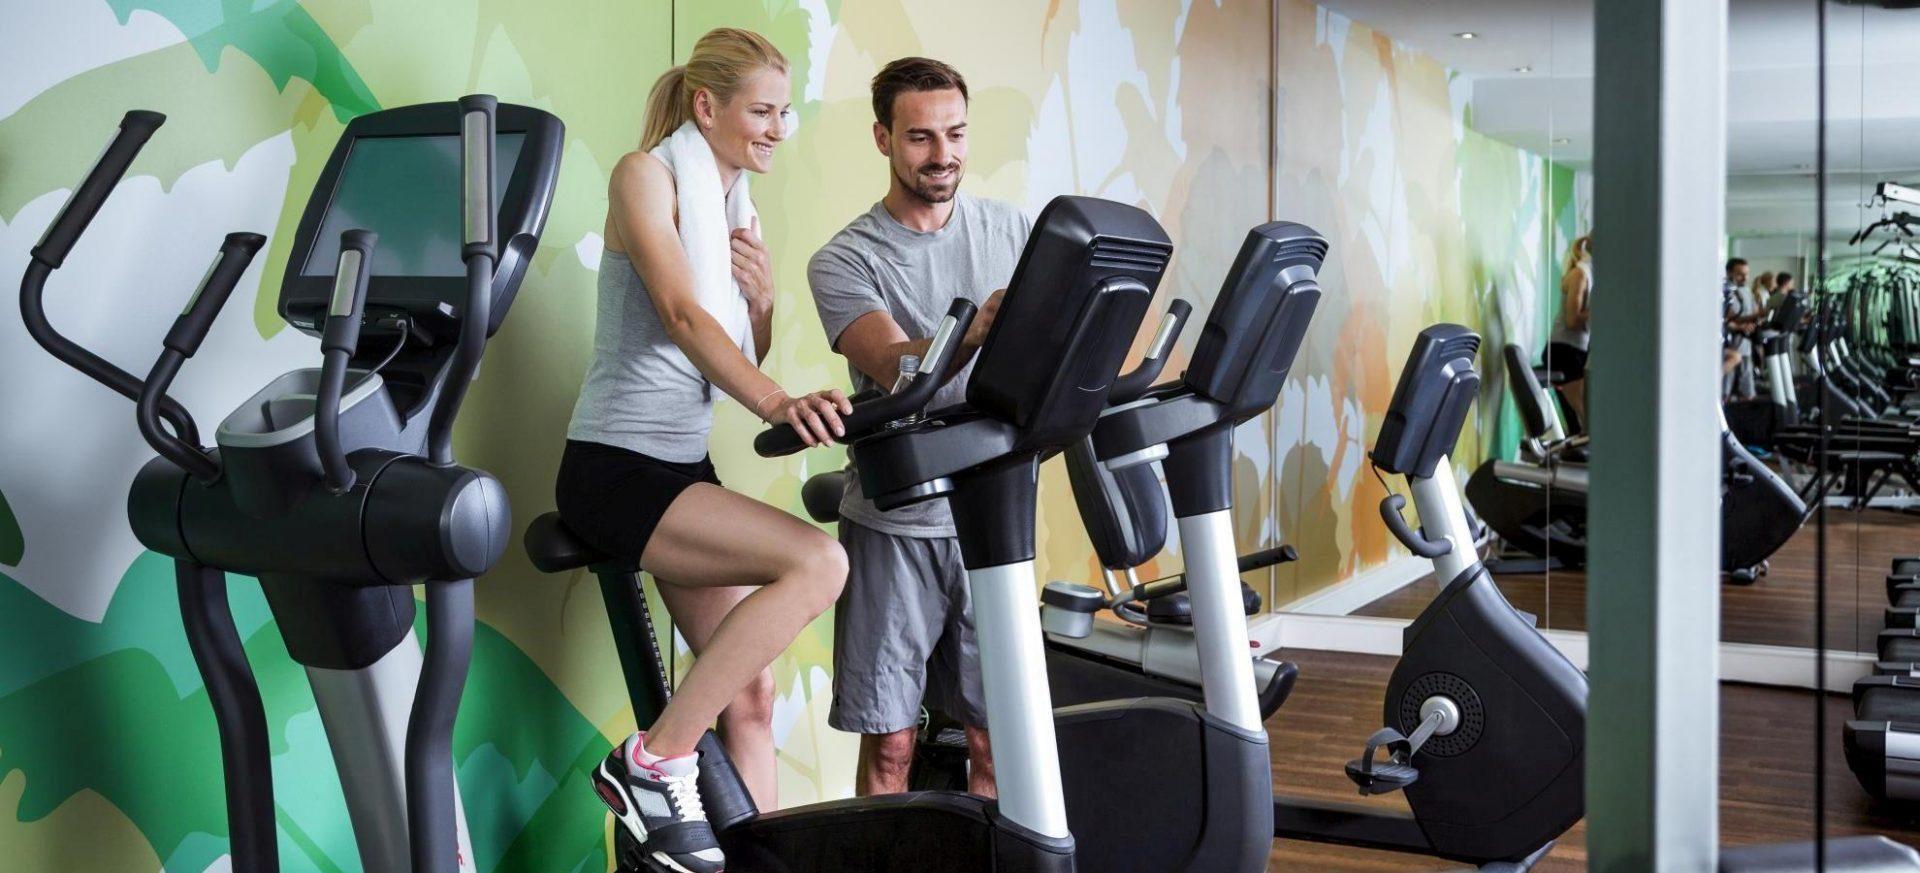 Pullman Munich Fitness